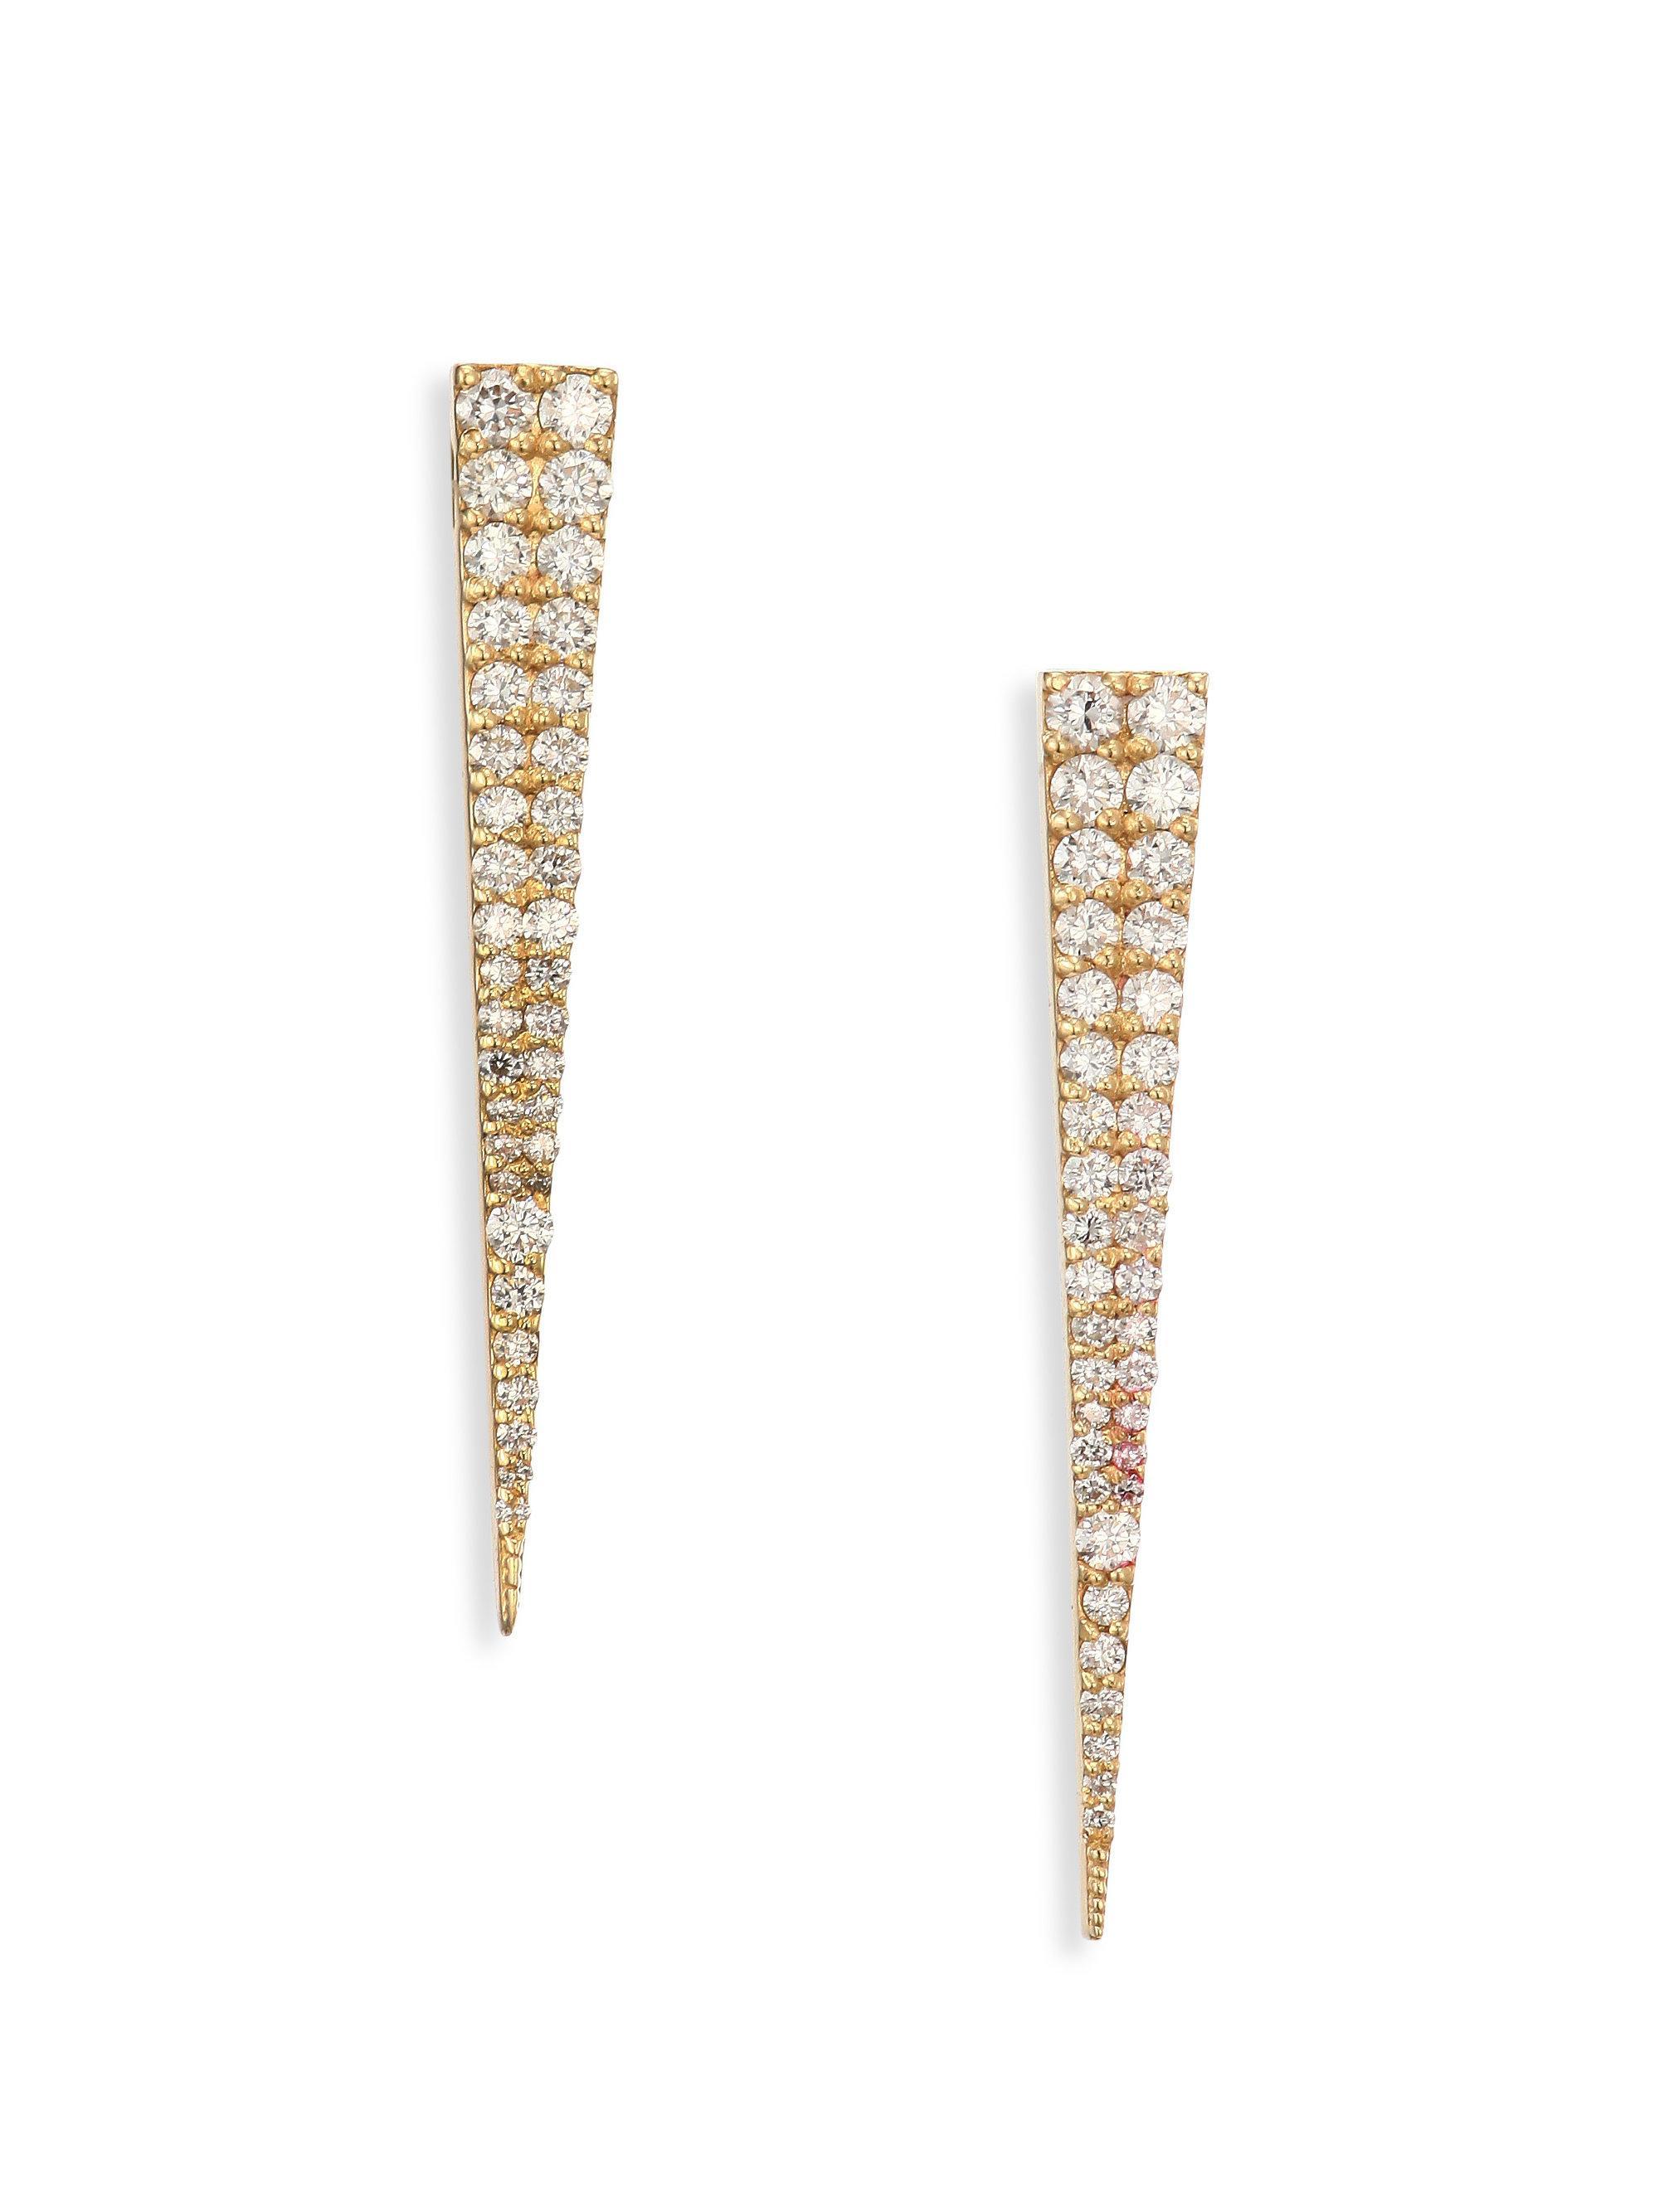 Lana Jewelry 14K Gold Long Expose Bar Earrings with Diamonds S3t8U0kG7